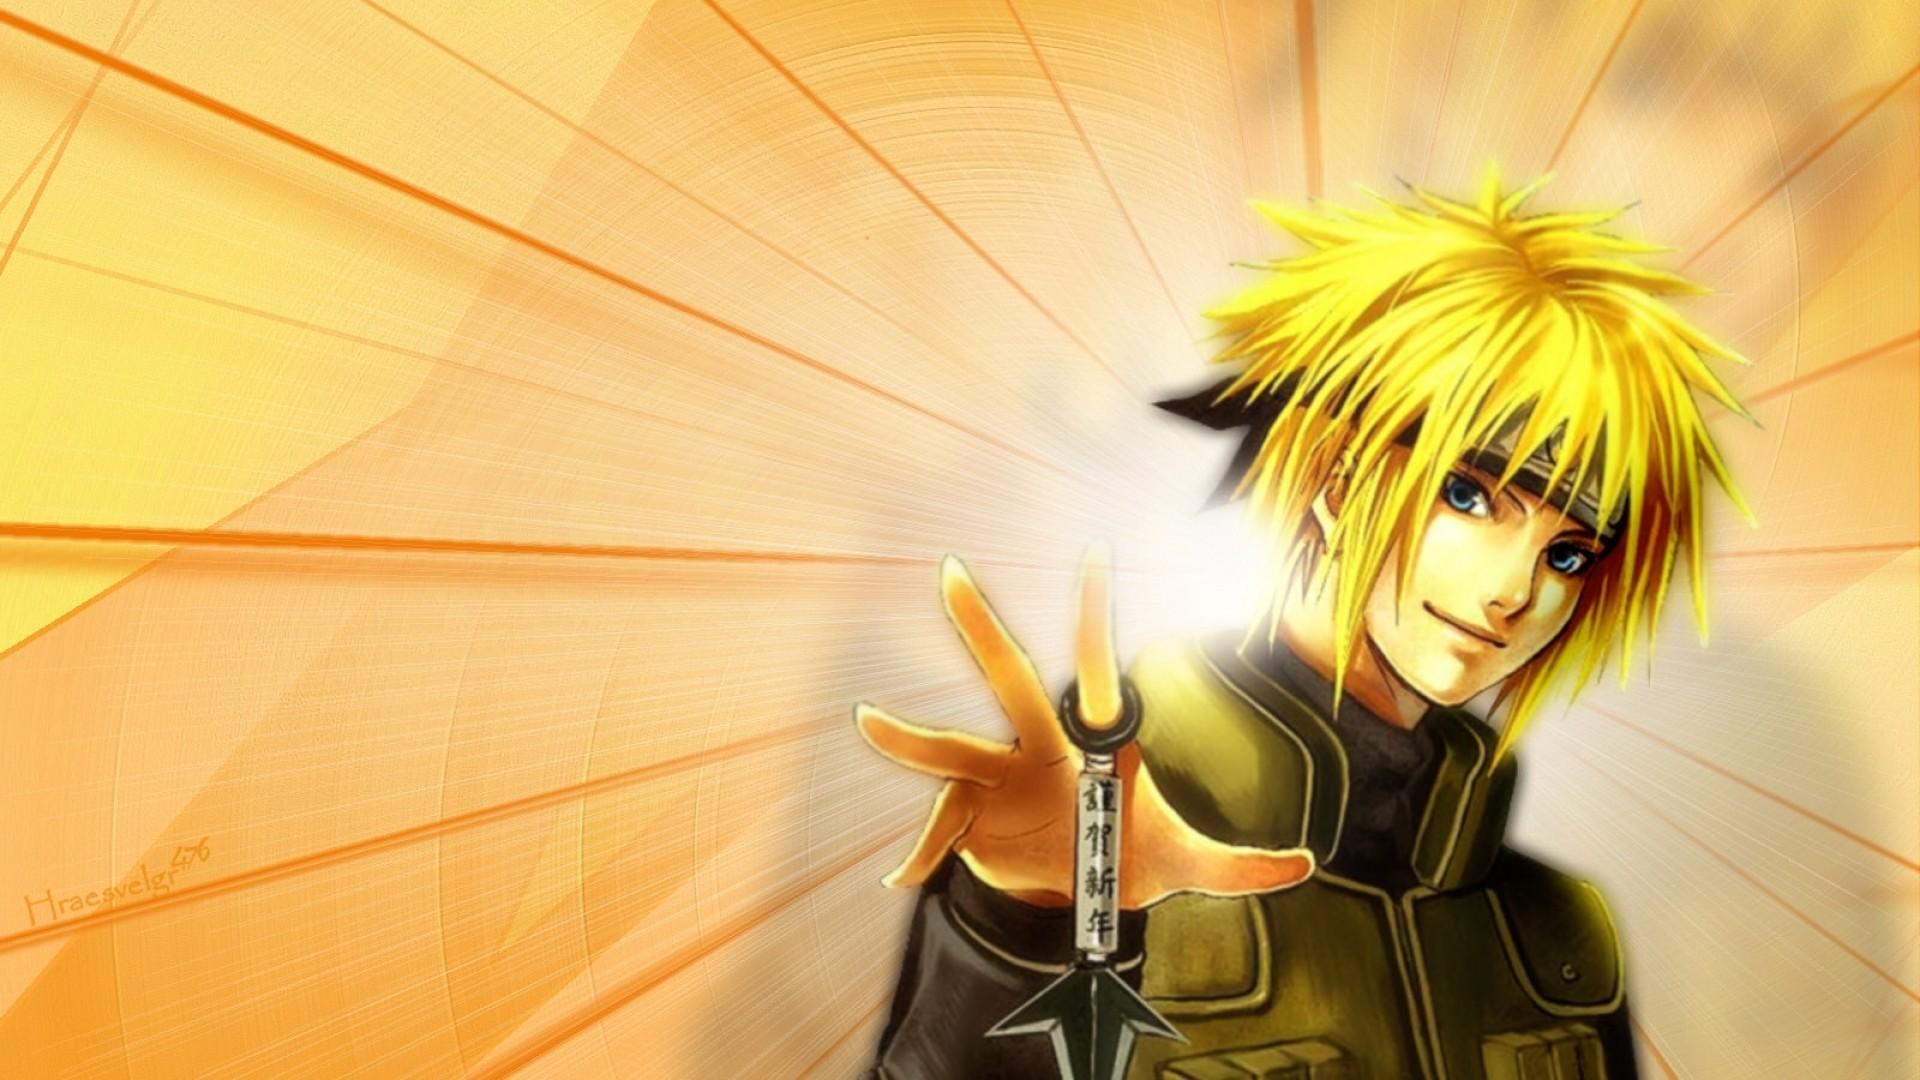 … Background Full HD 1080p. Wallpaper anime, uchiha sasuke,  naruto, boy, blond, smile, light